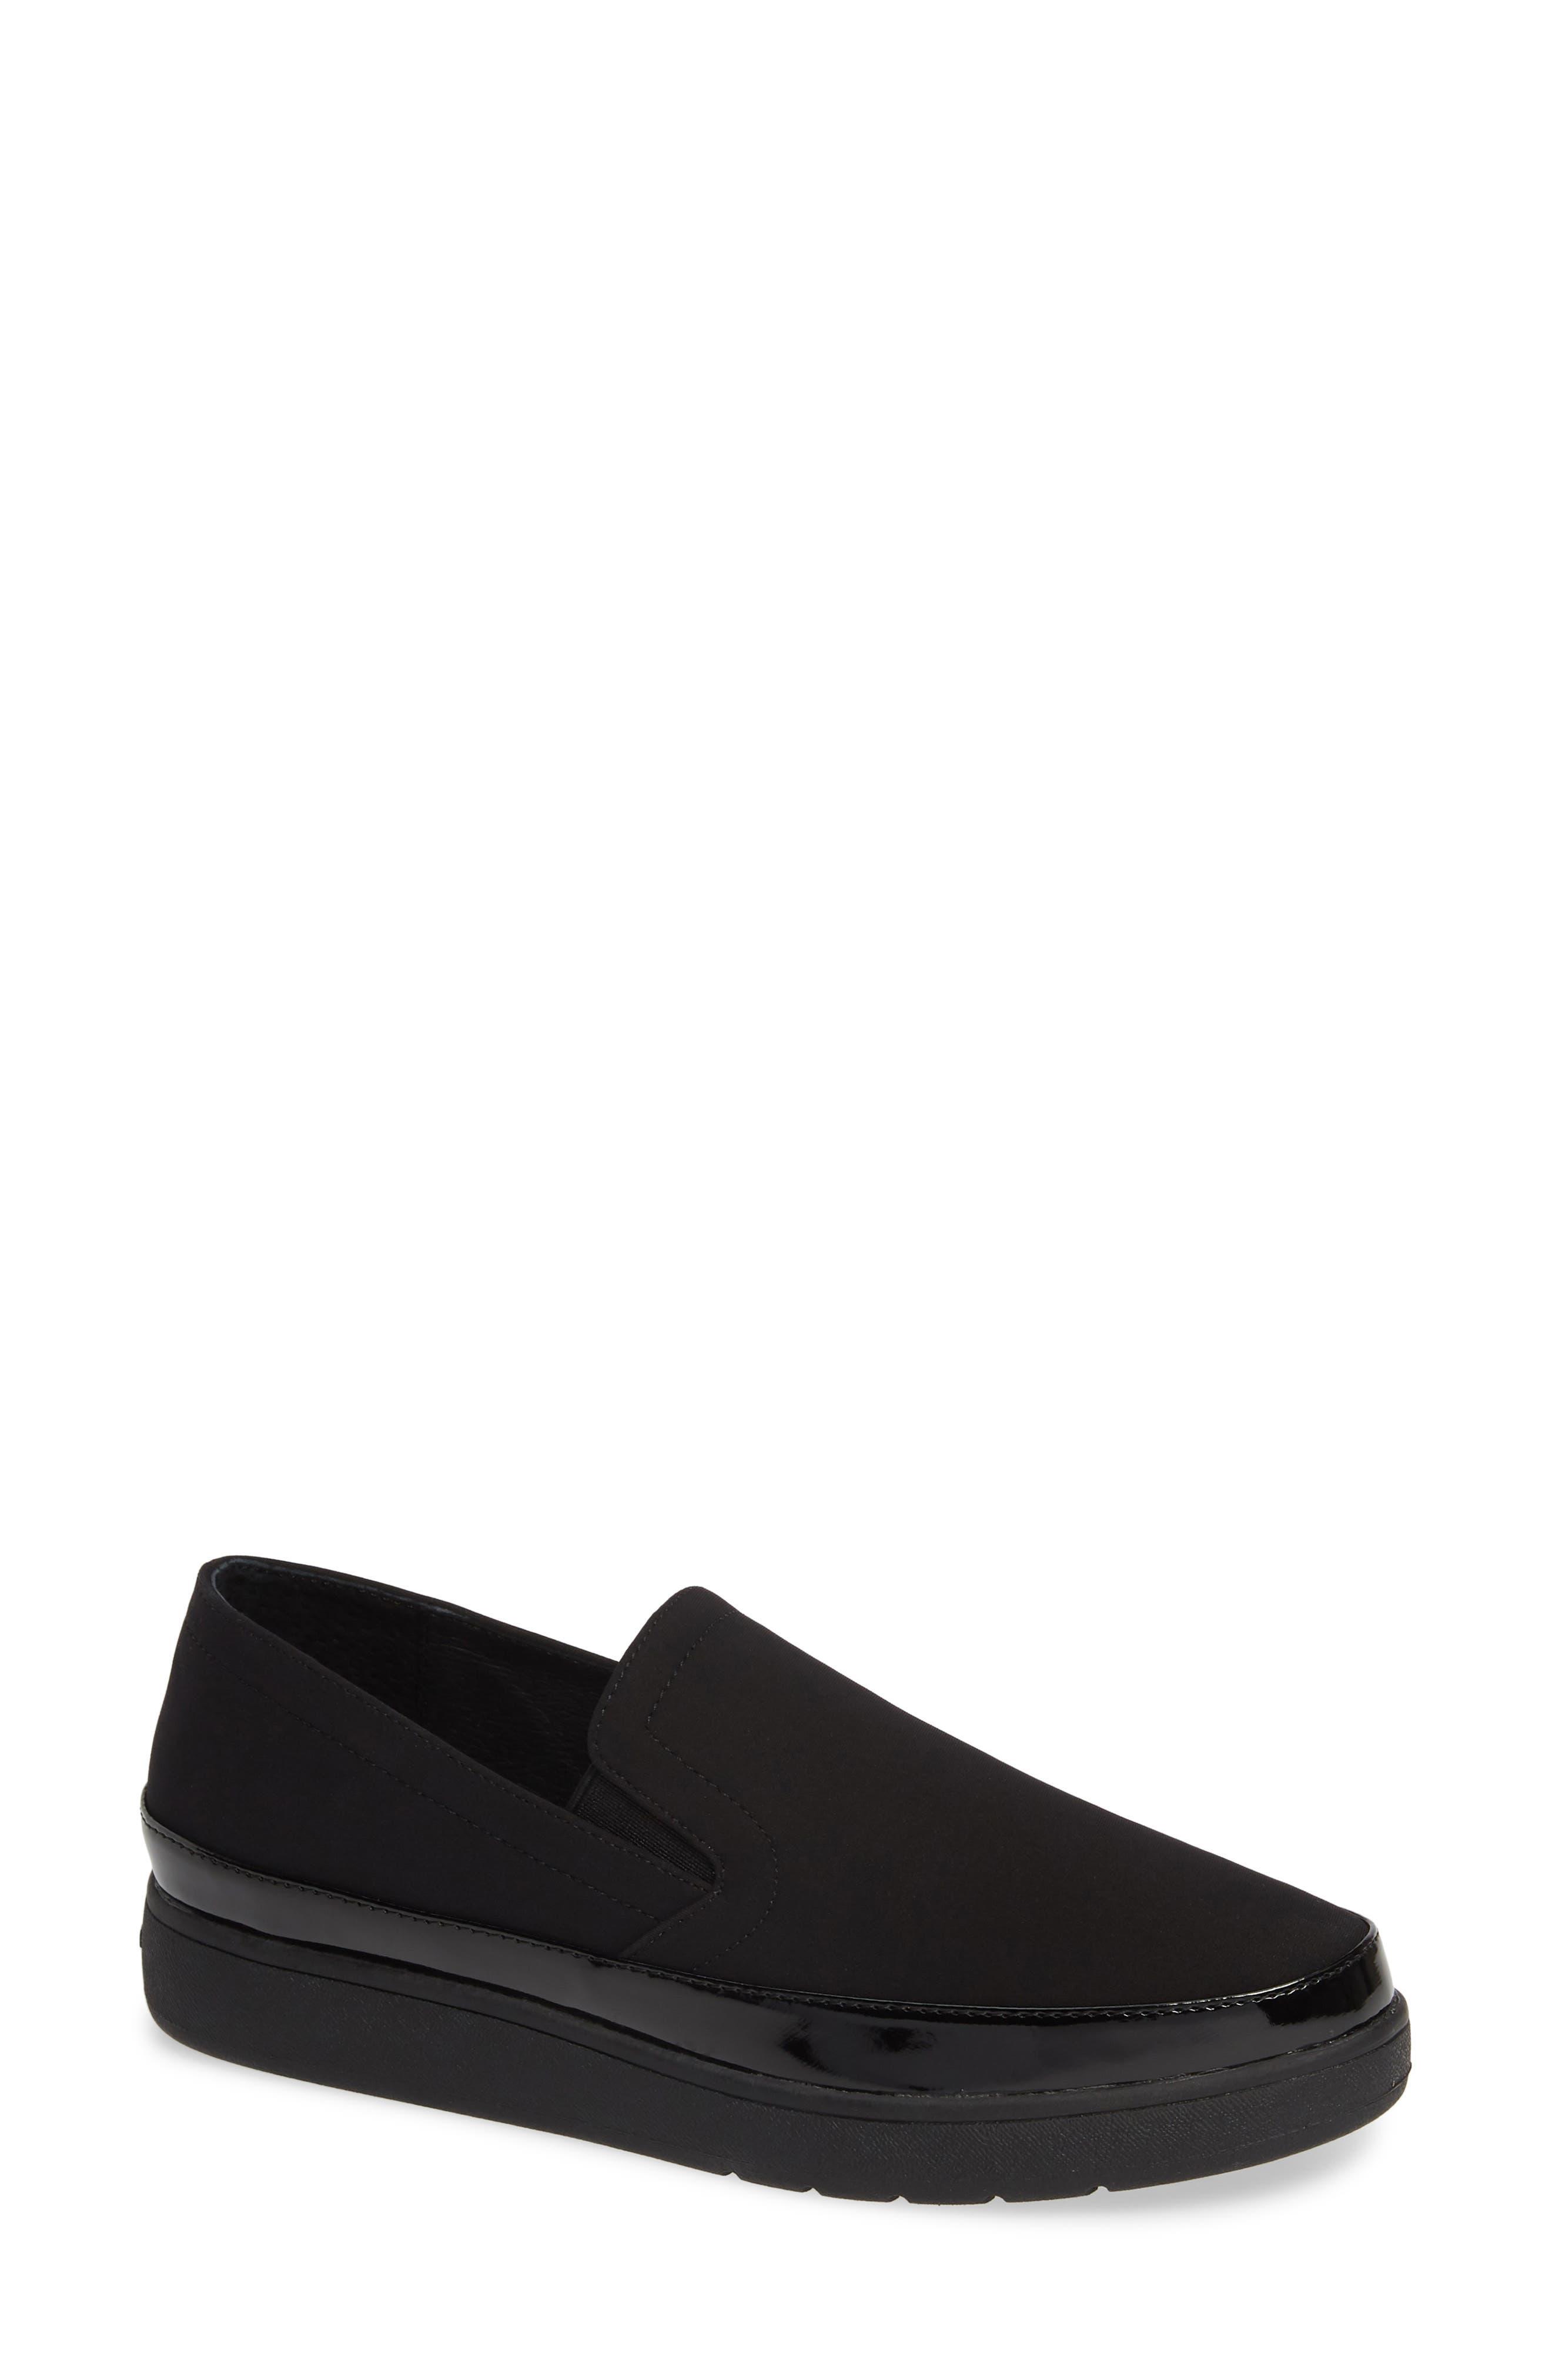 DONALD PLINER Women'S Med Stretch Platform Sneakers in Black